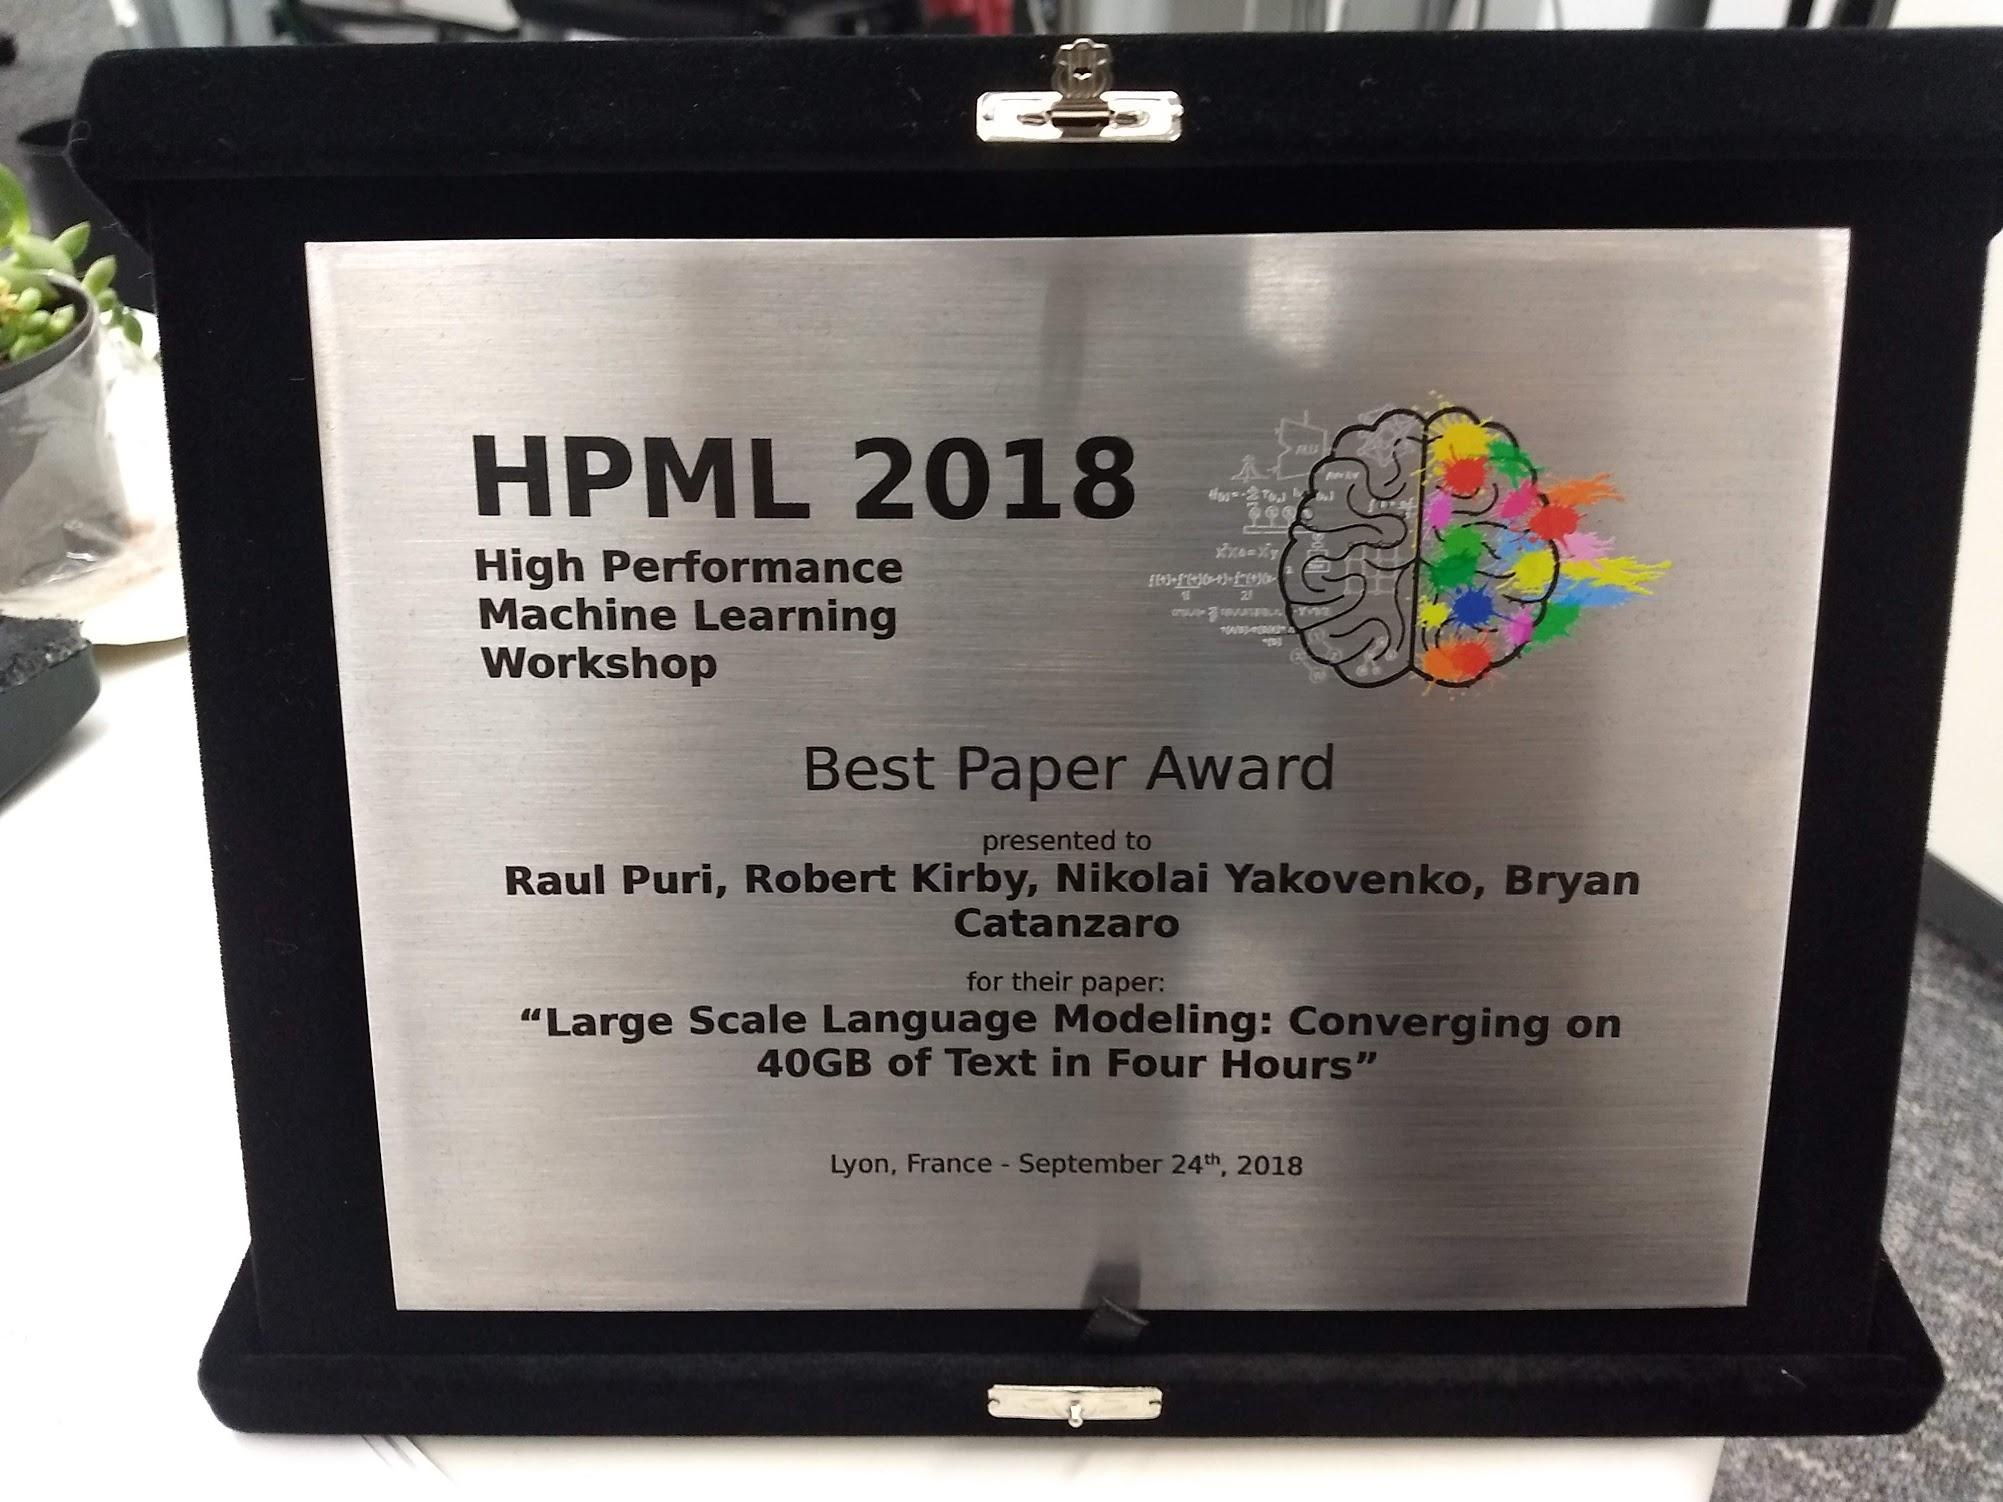 HPML 2018: HIGH PERFORMANCE MACHINE LEARNING